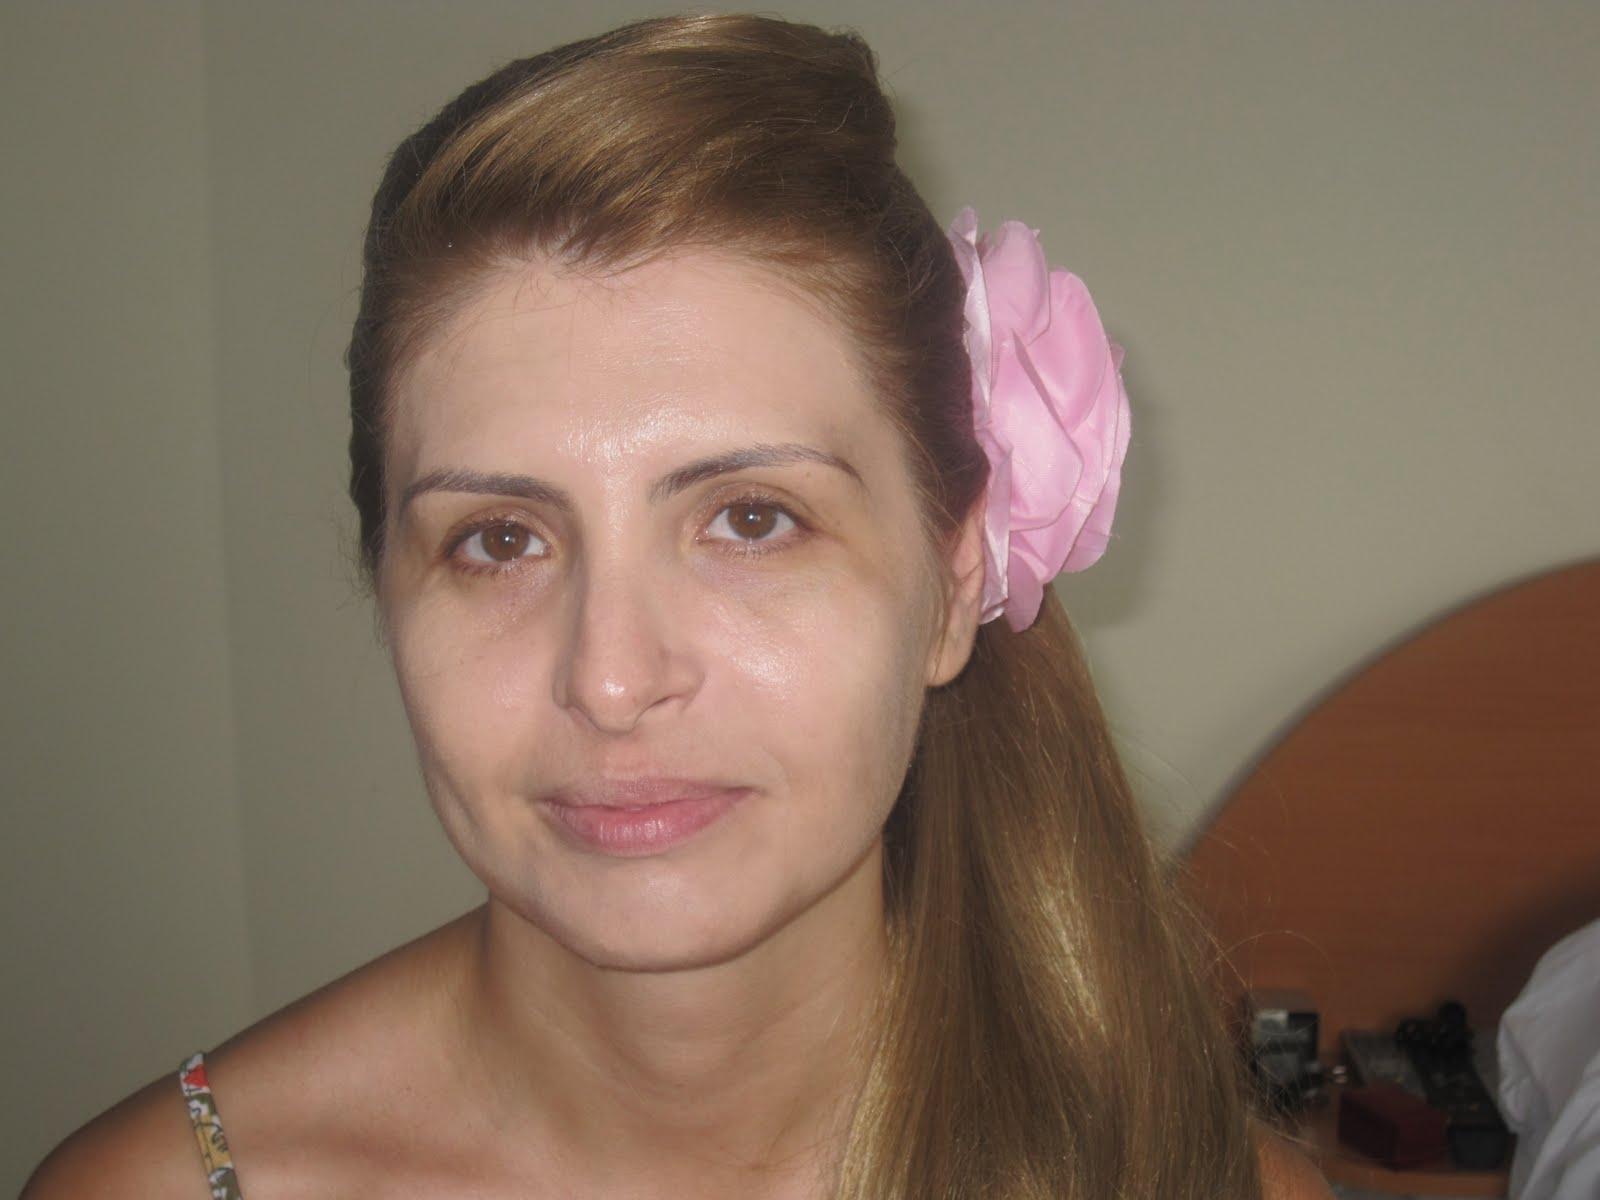 Machiaj Corector Schimbare De Look Suzana Visan Professional